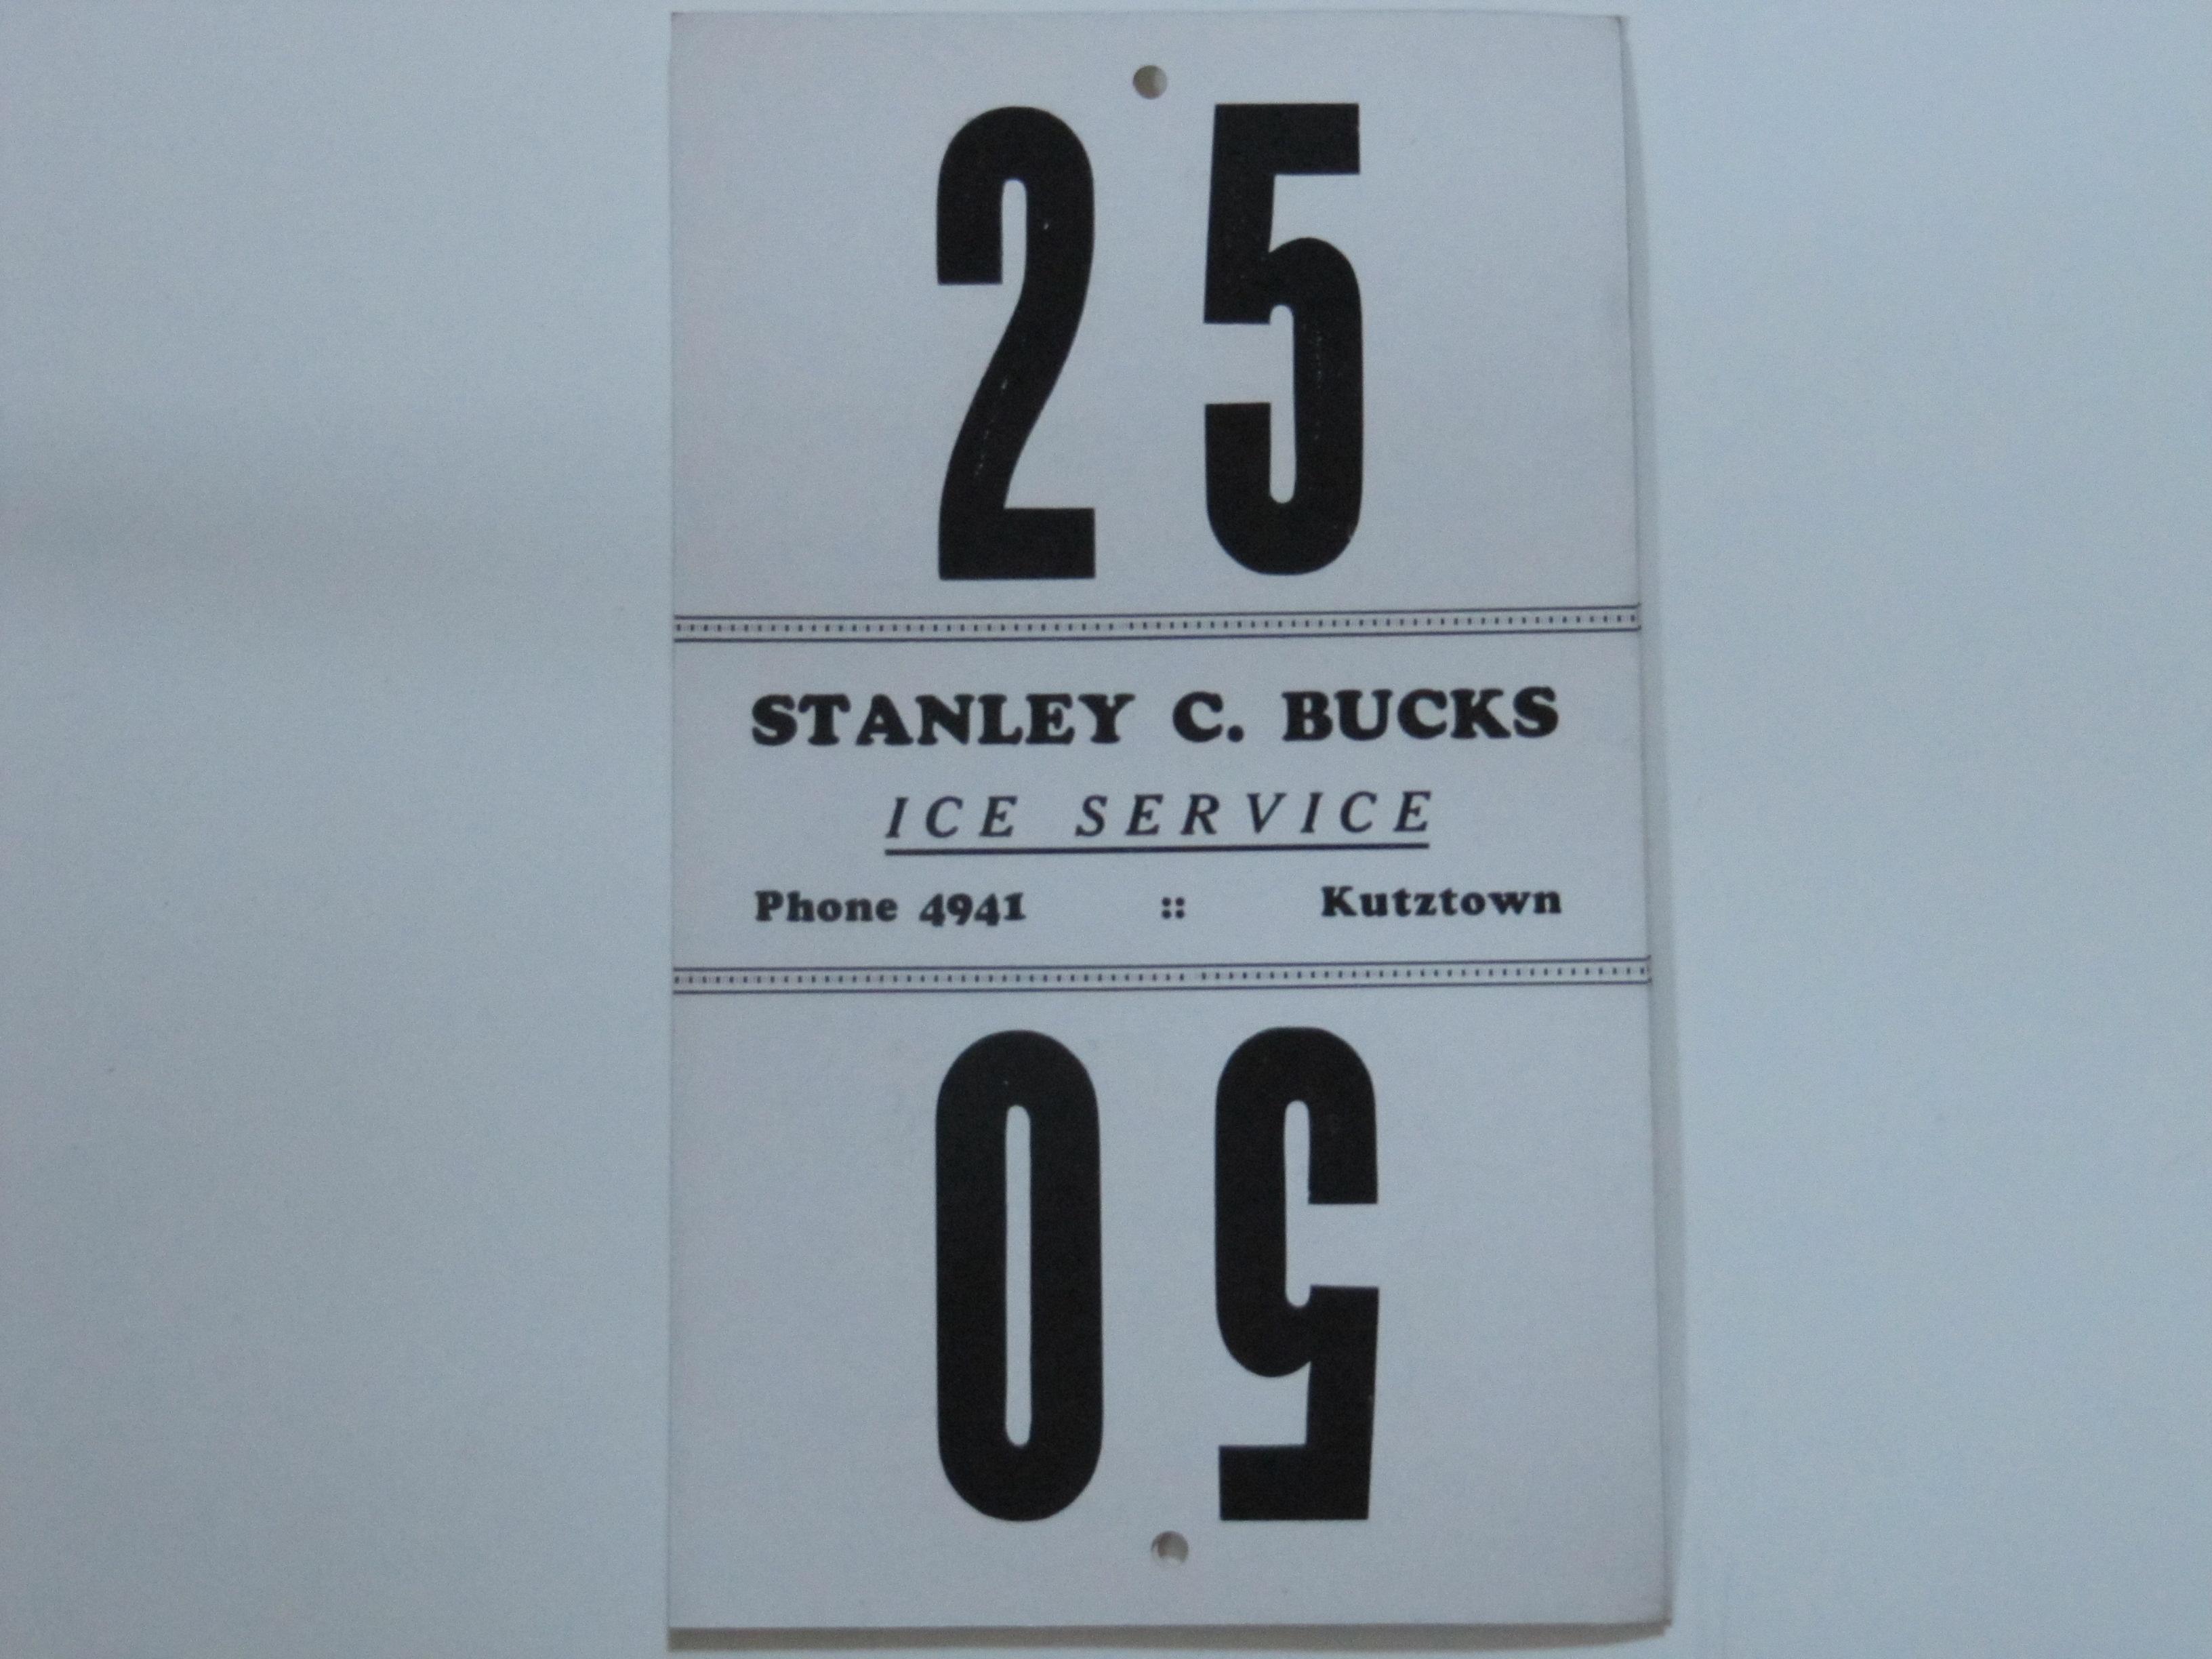 Stanley C. Bucks